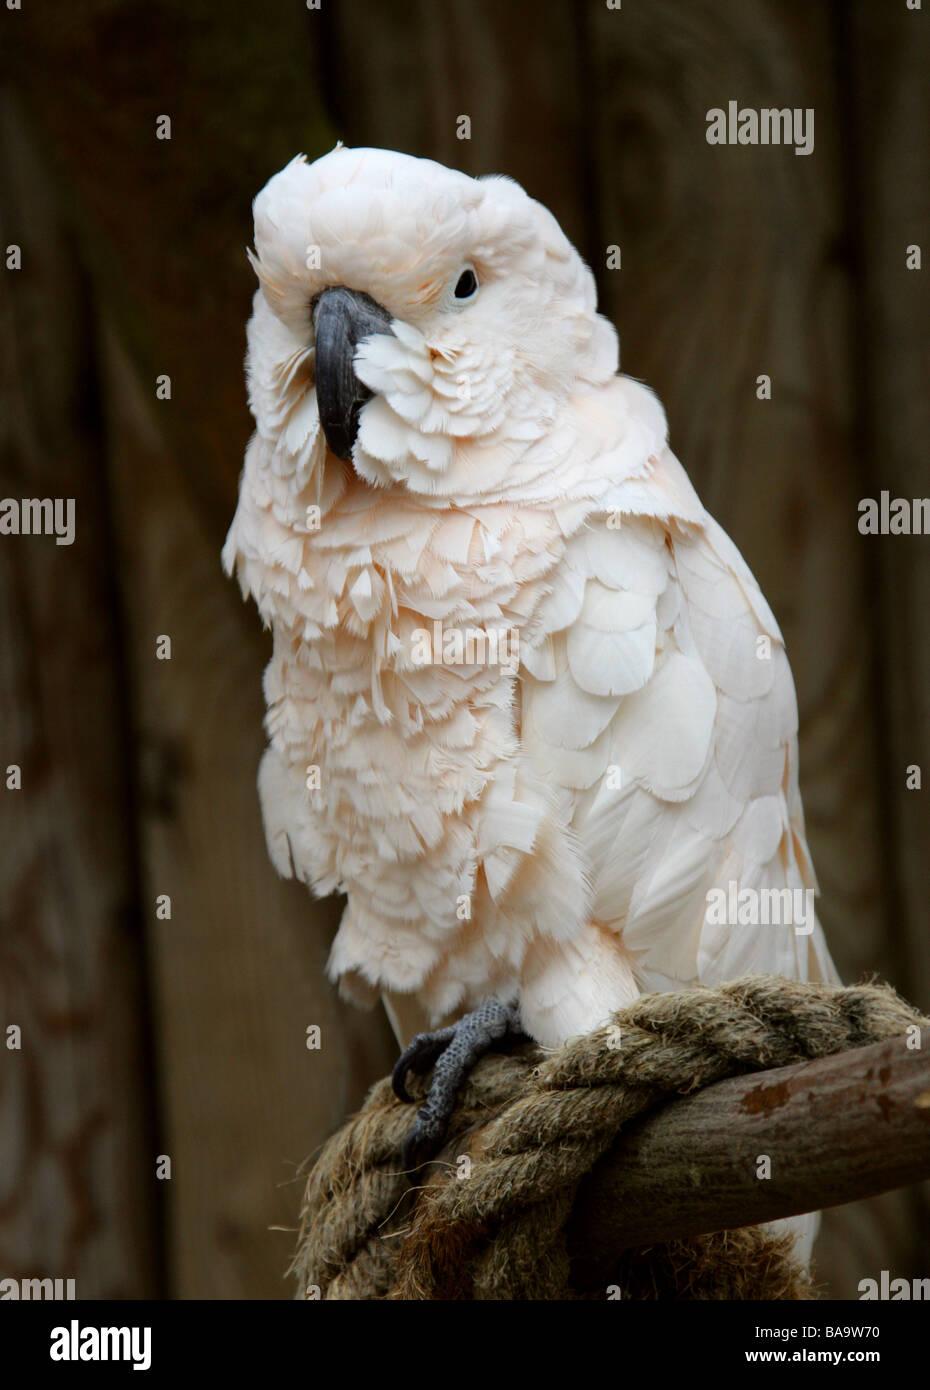 Moluccan Cockatoo, Cacatua moluccensis, aka Salmon-crested Cockatoo, Cacatuidae. - Stock Image